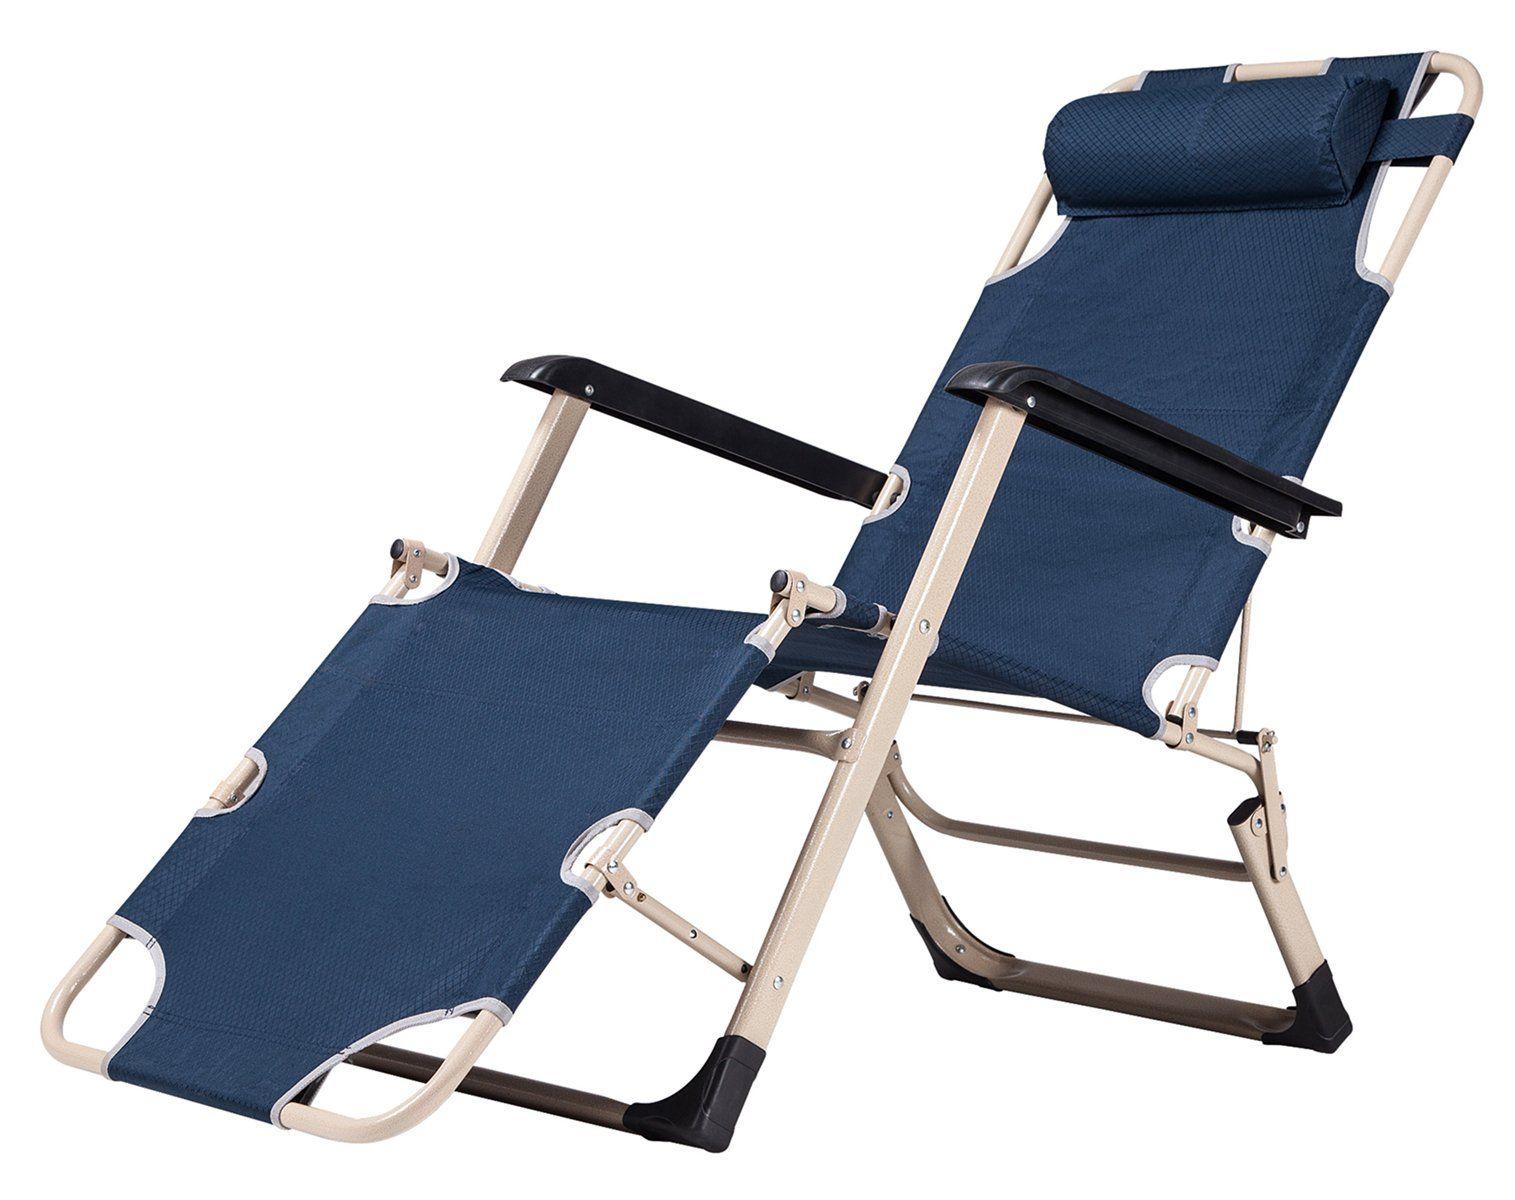 Landtrip Foldable Zero Gravity Lounge Chair outdoor Patio